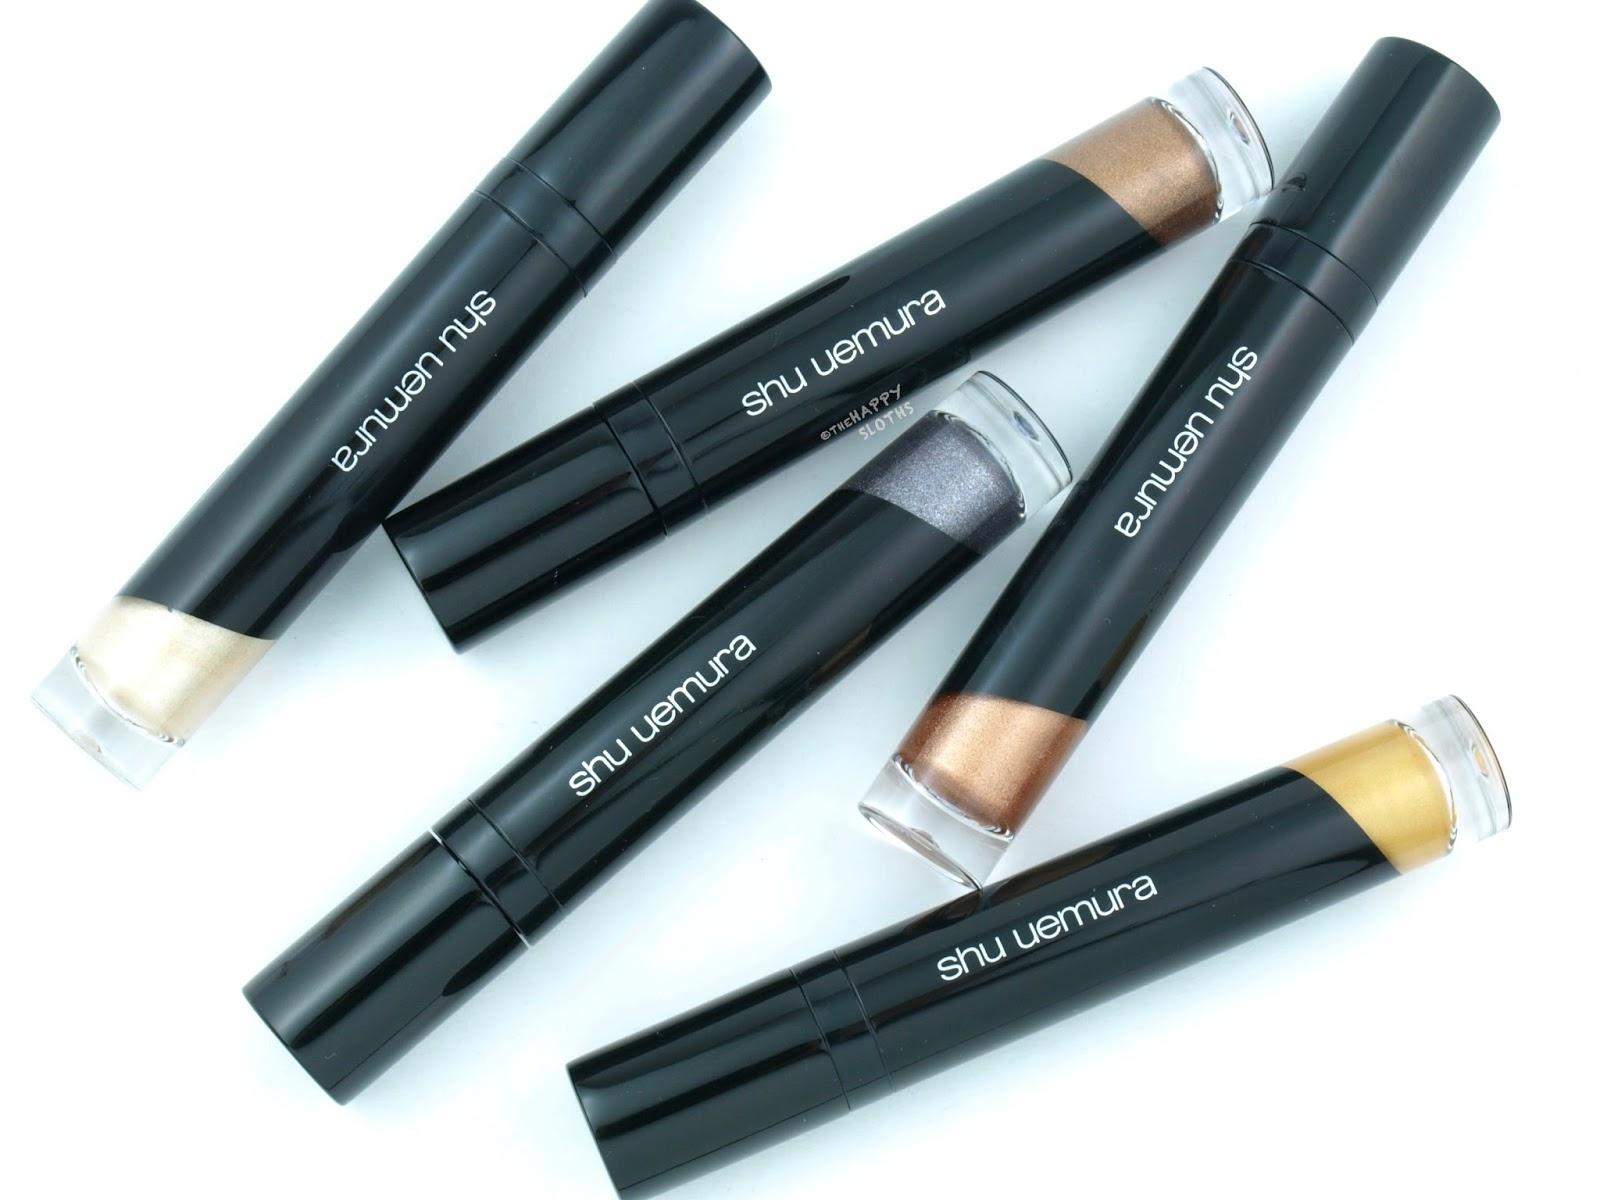 Shu Uemura Eye Foil Liquid Eye Shadow: Review and Swatches